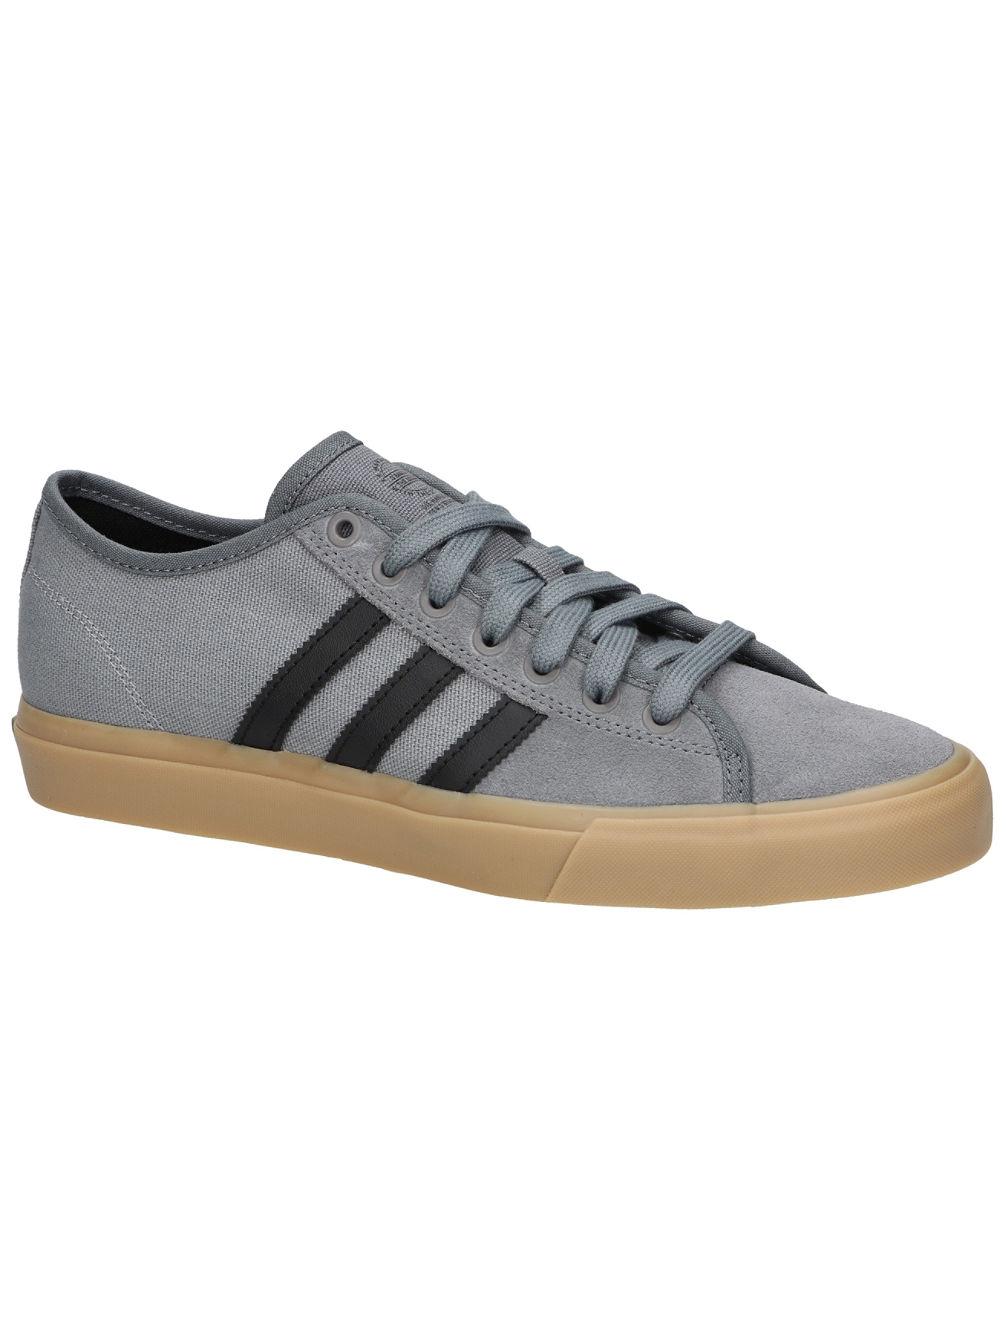 uk availability cd08a 05ee6 adidas Skateboarding Matchcourt RX Skate Shoes